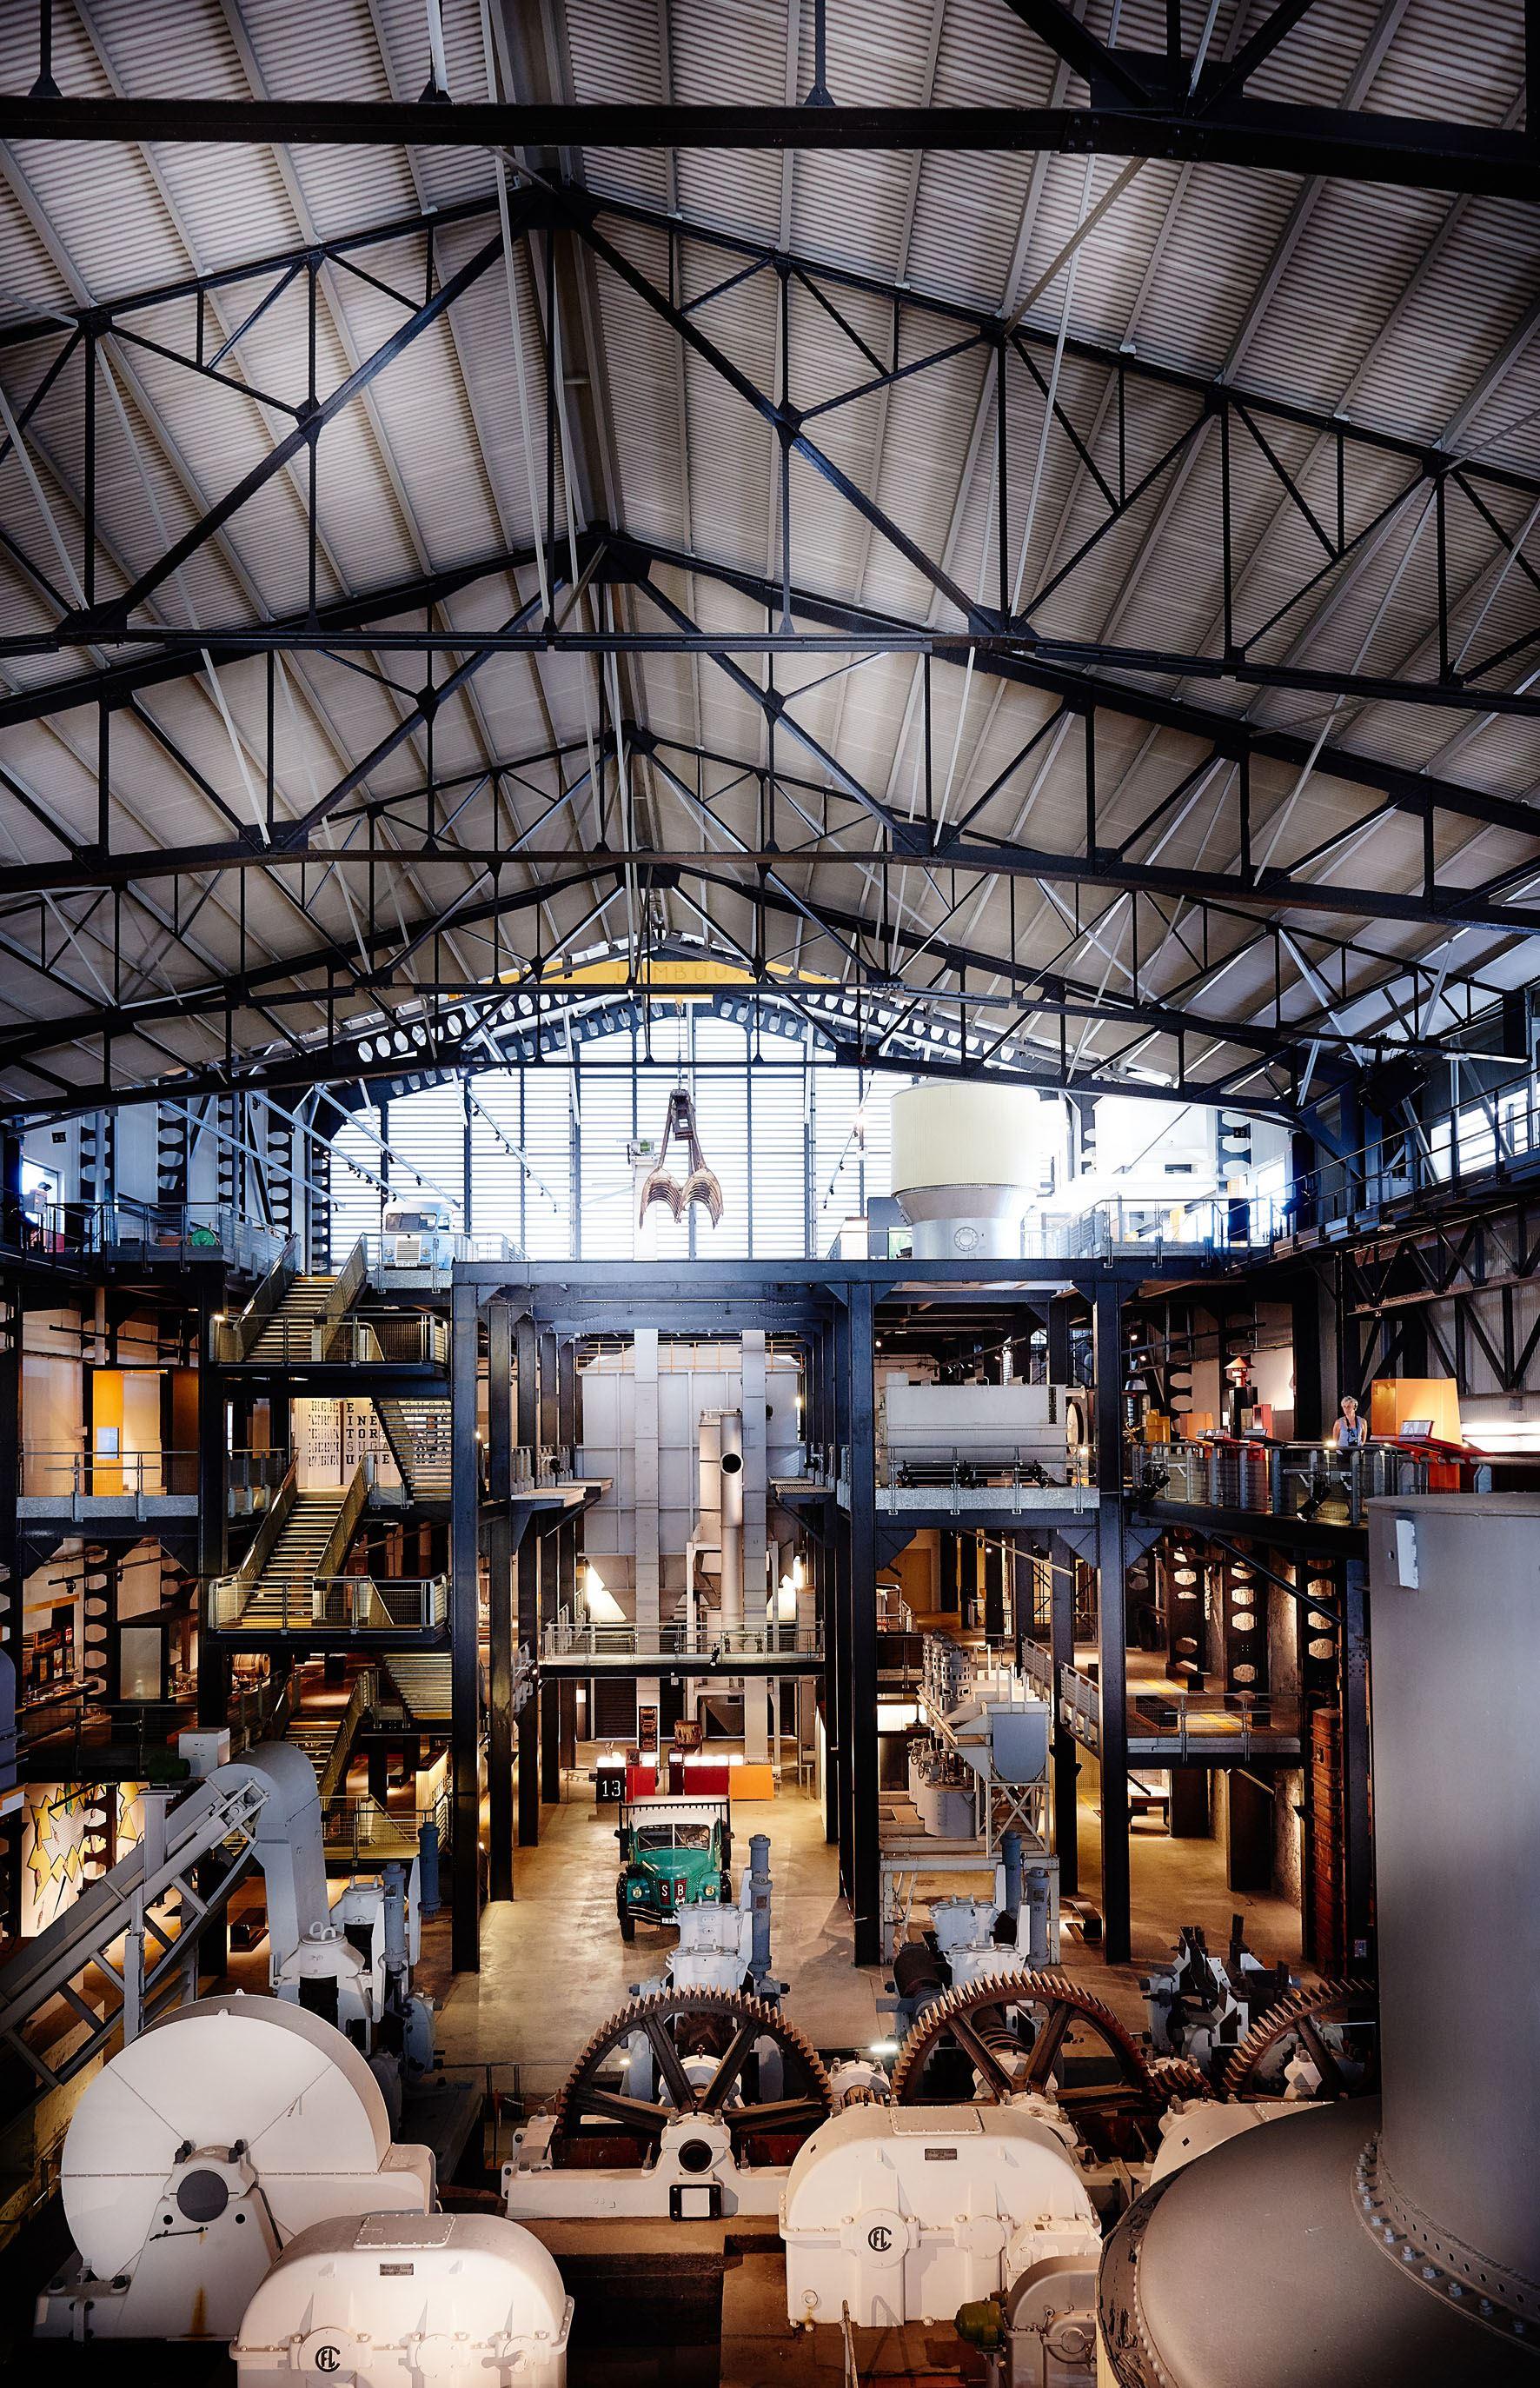 Musée Stella Matutina : visite libre